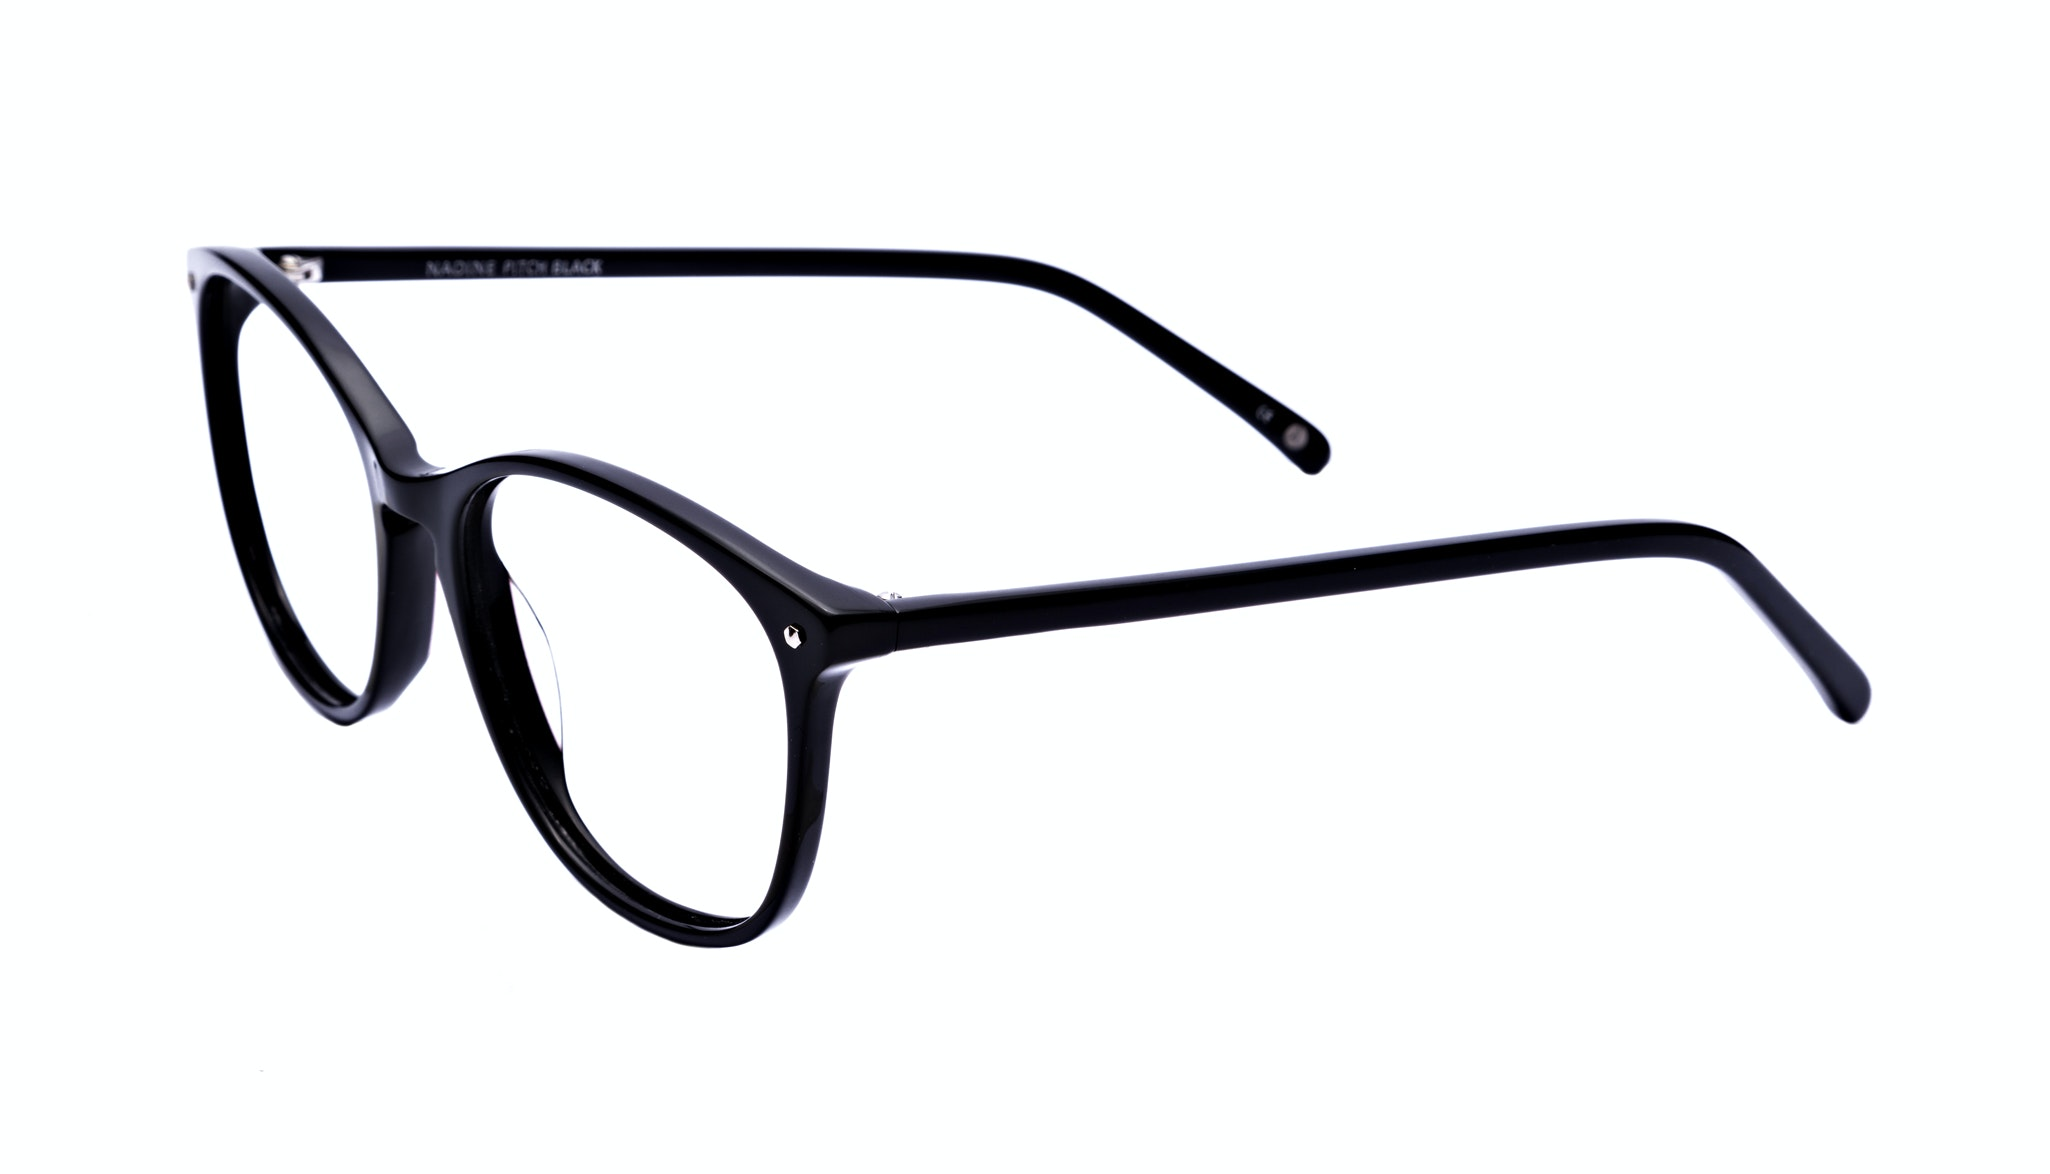 Affordable Fashion Glasses Rectangle Square Round Eyeglasses Women Nadine Pitch Black Tilt